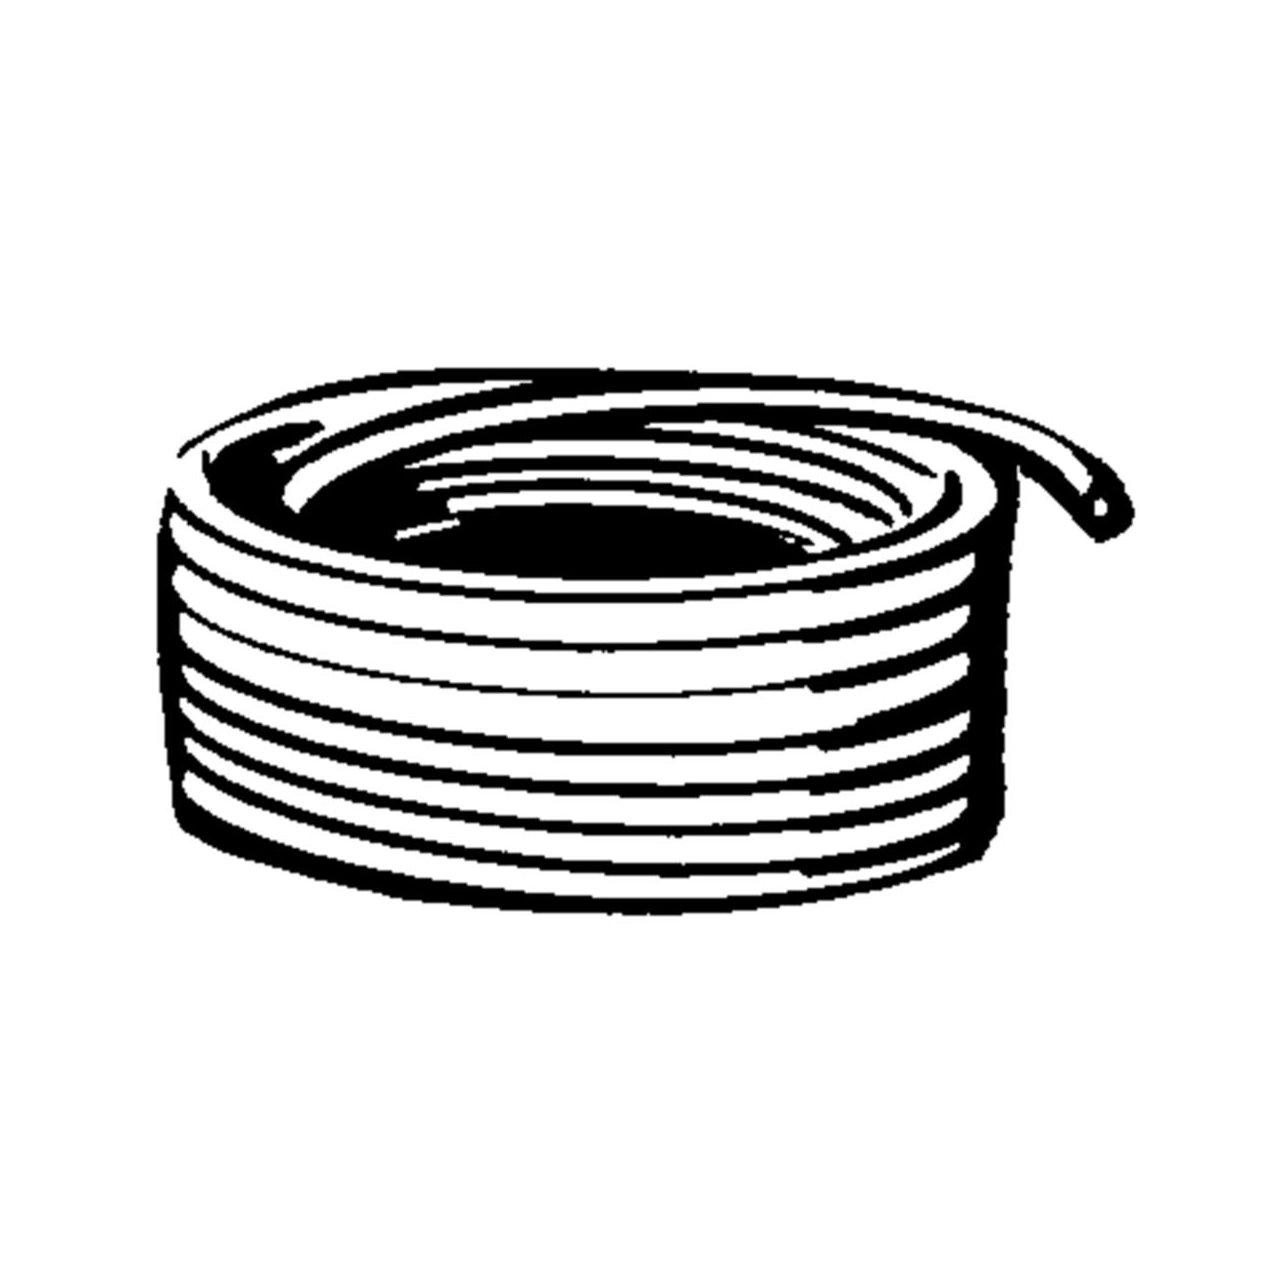 Harvey 093175 7/8-Inch by 50-Foot Dishwasher Hose